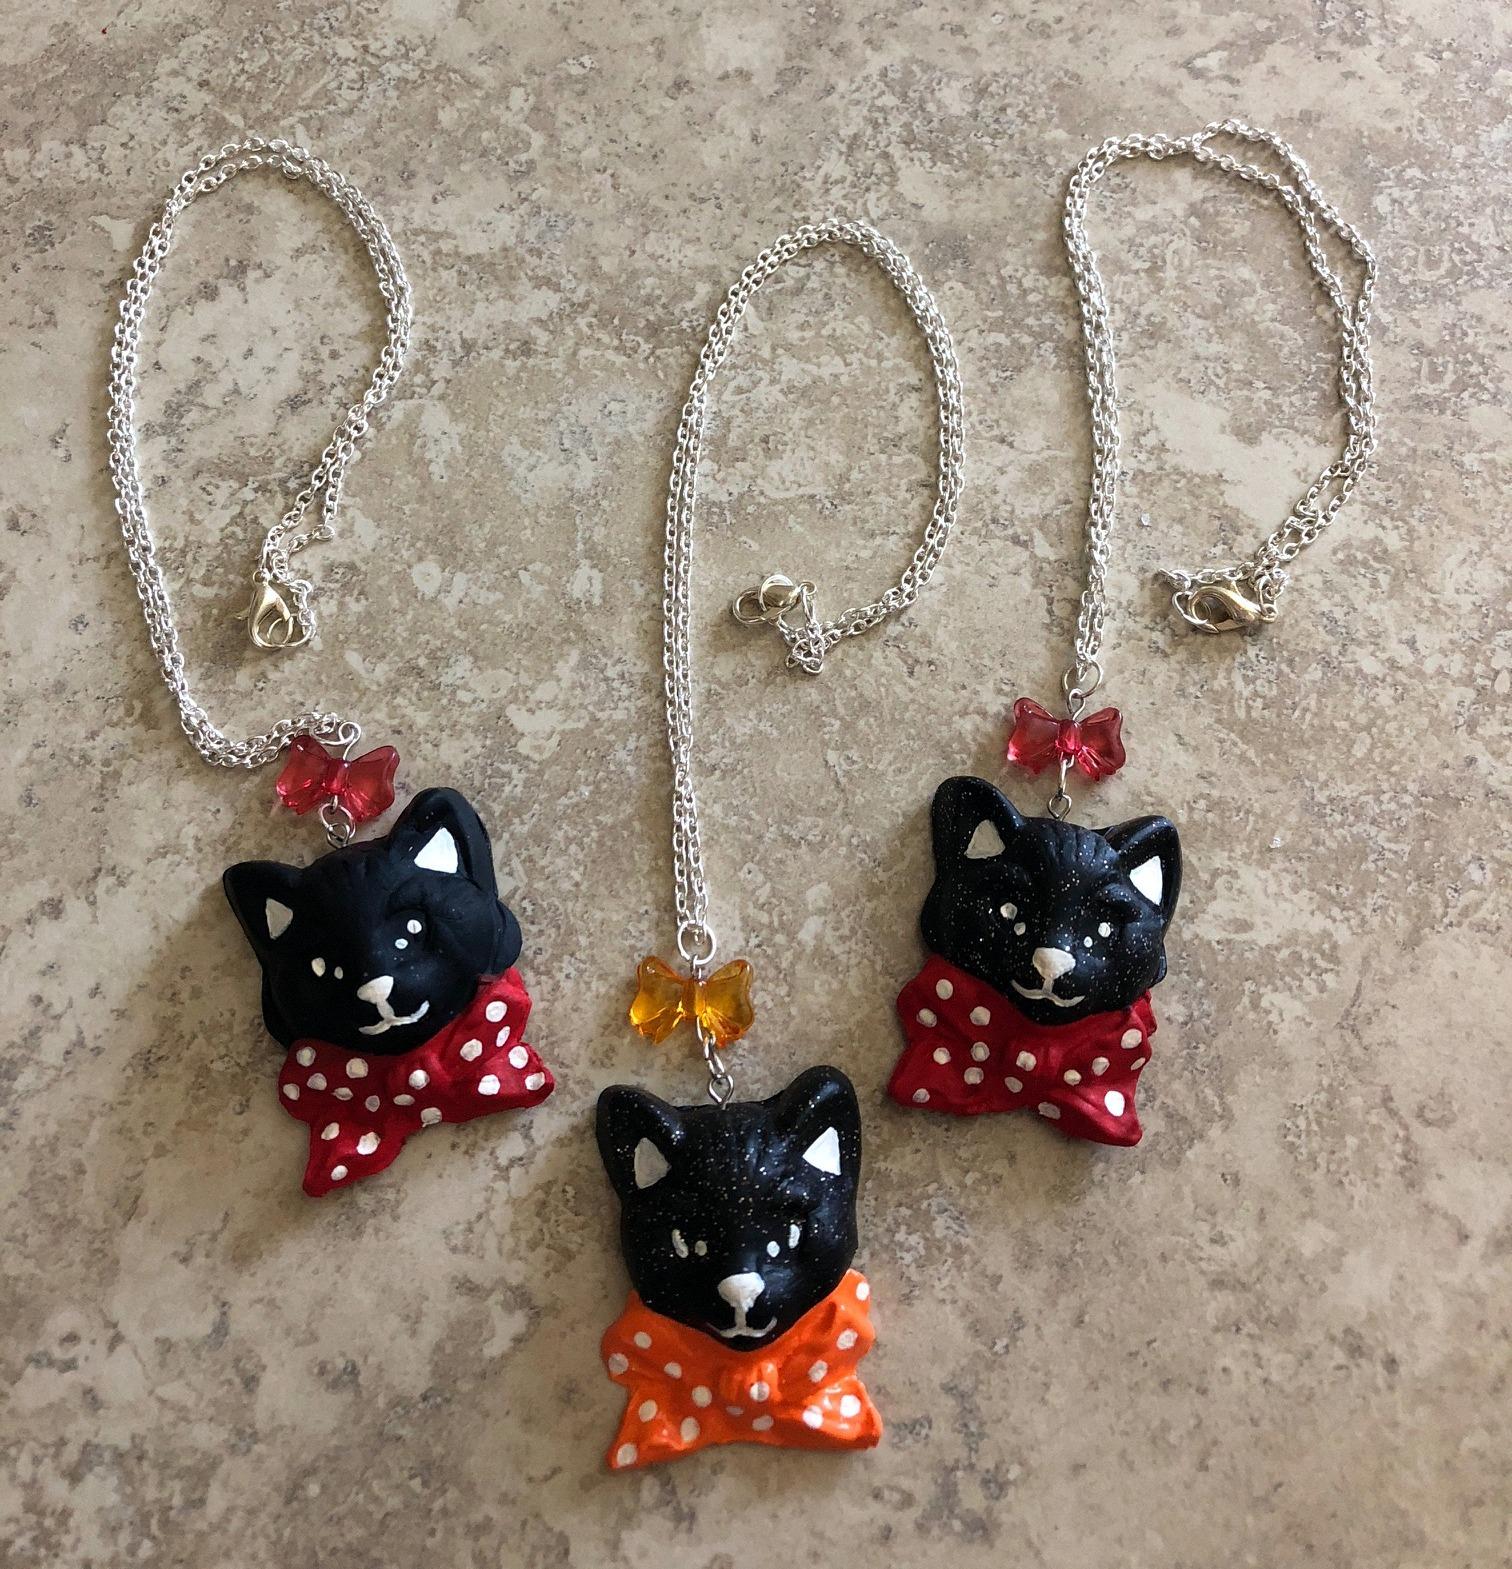 Pretty Kitty Polka Dot Cat Clay Necklace